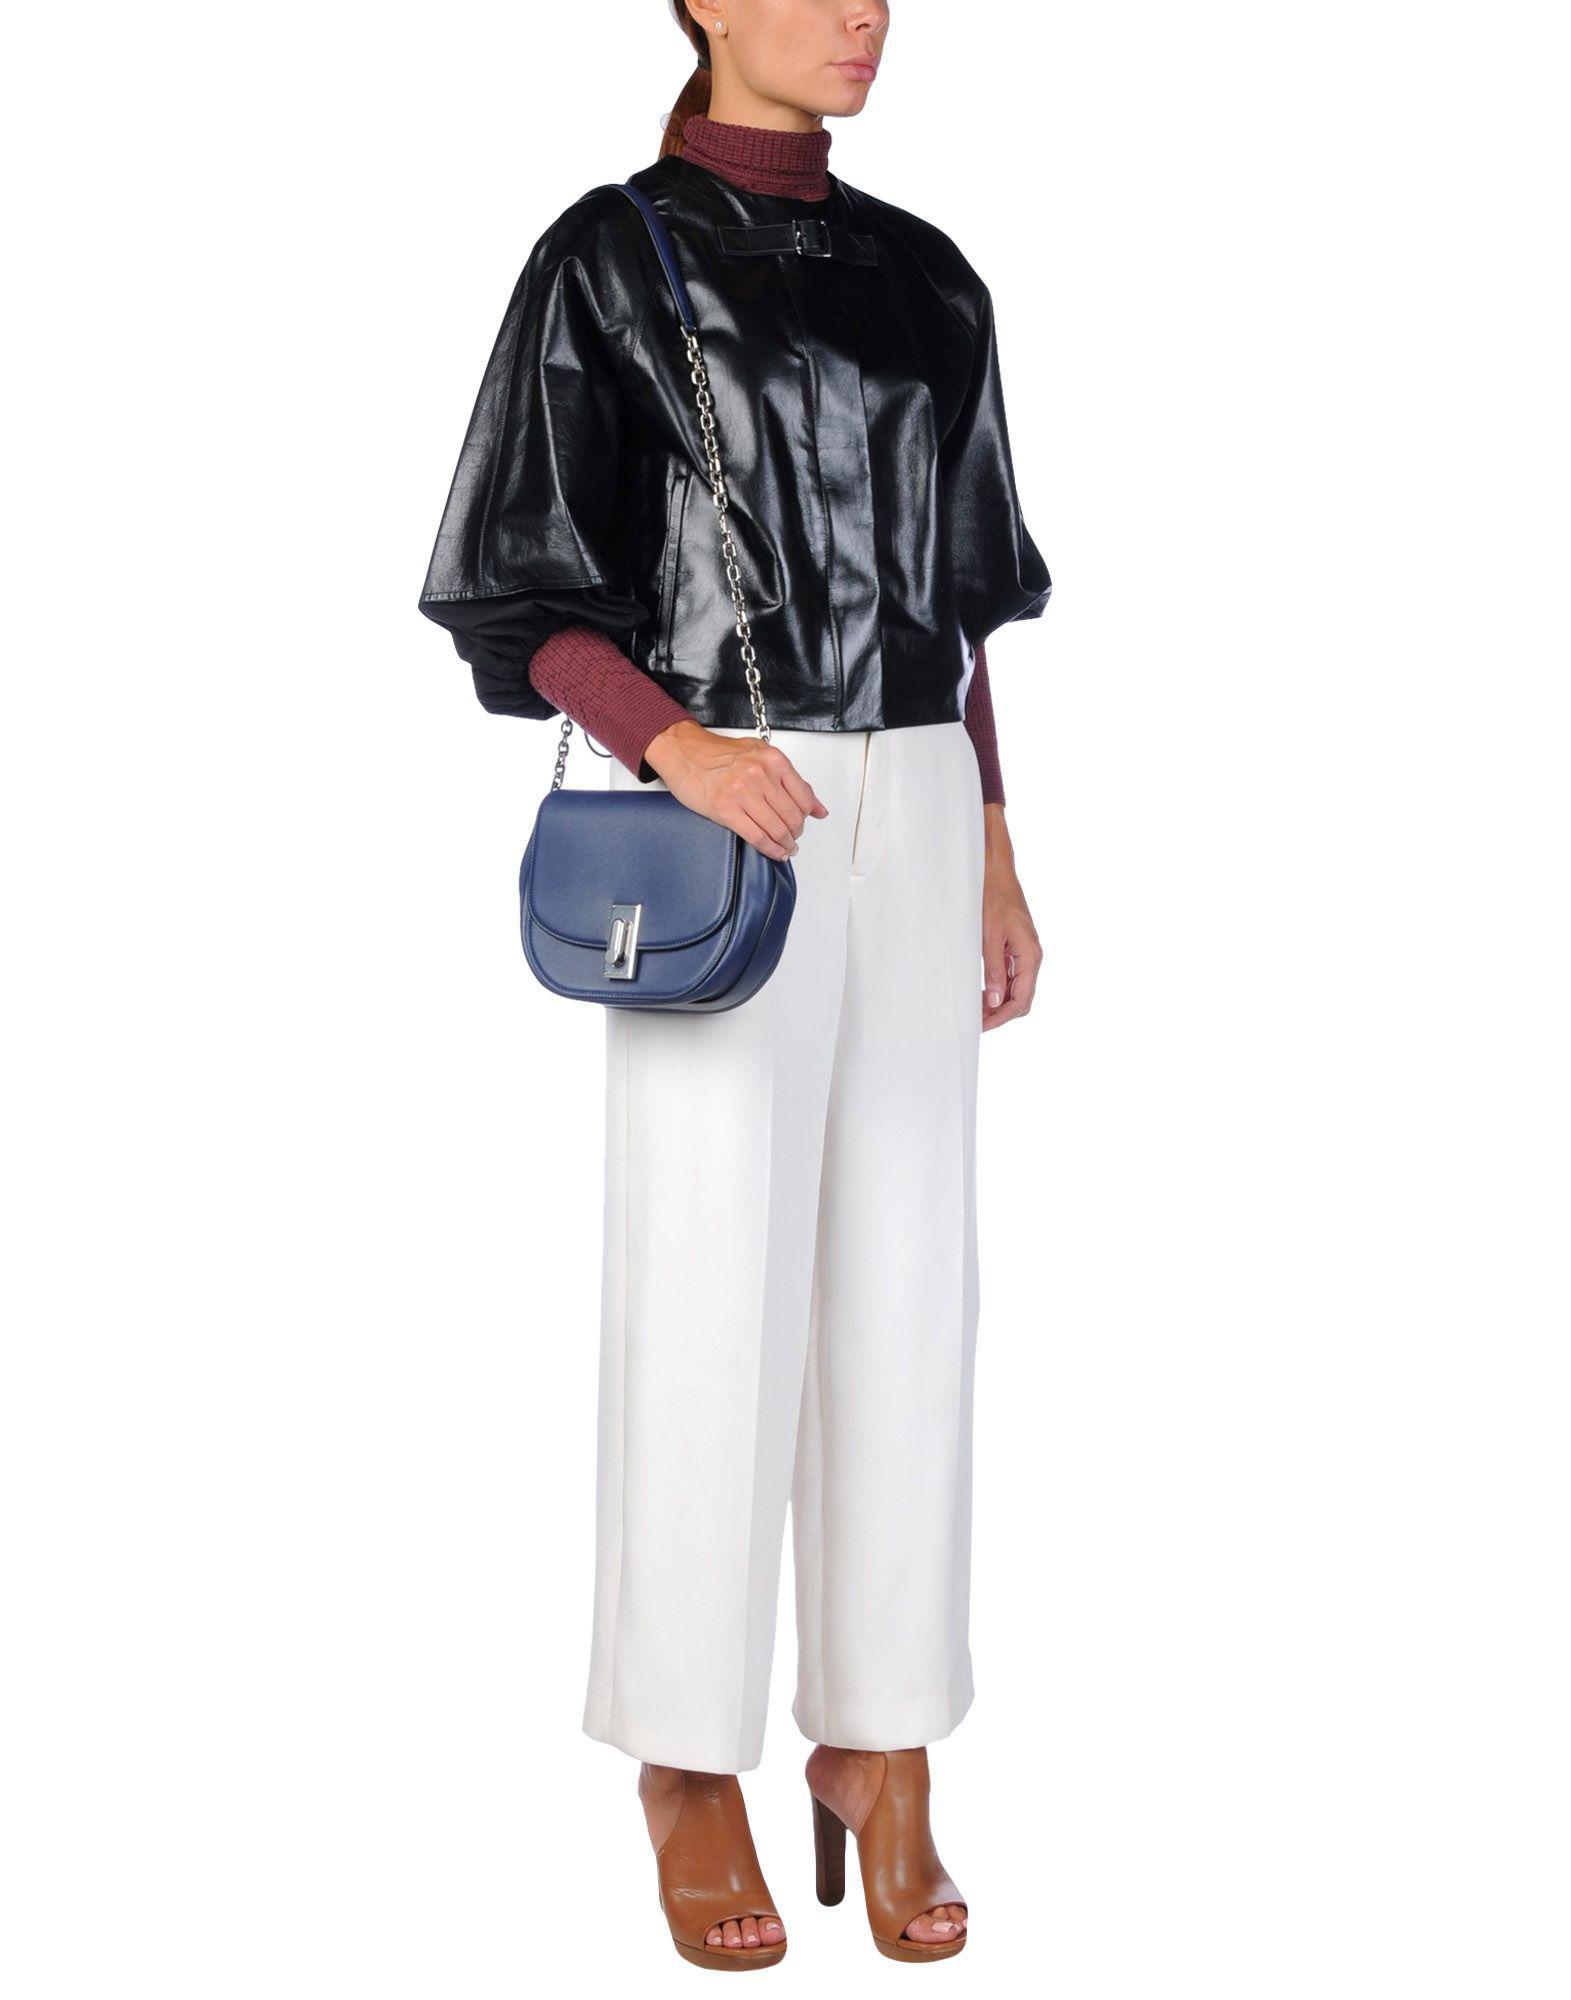 Marc Jacobs Leather Cross-body Bag in Dark Blue (Blue)